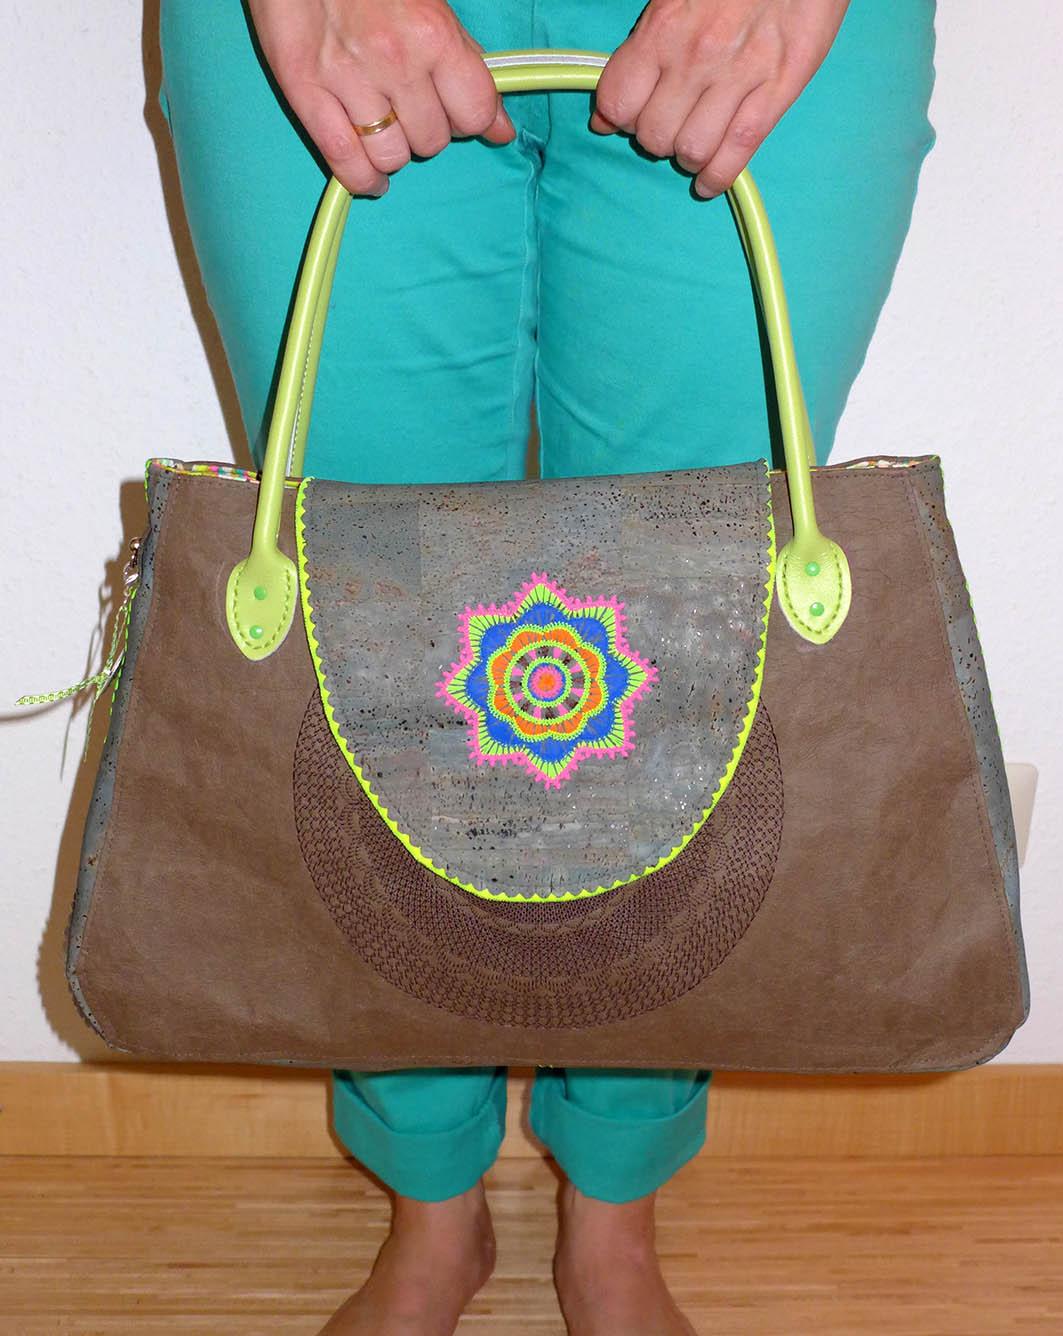 Snap-Pap – meine erste Handtasche! » BERNINA Blog